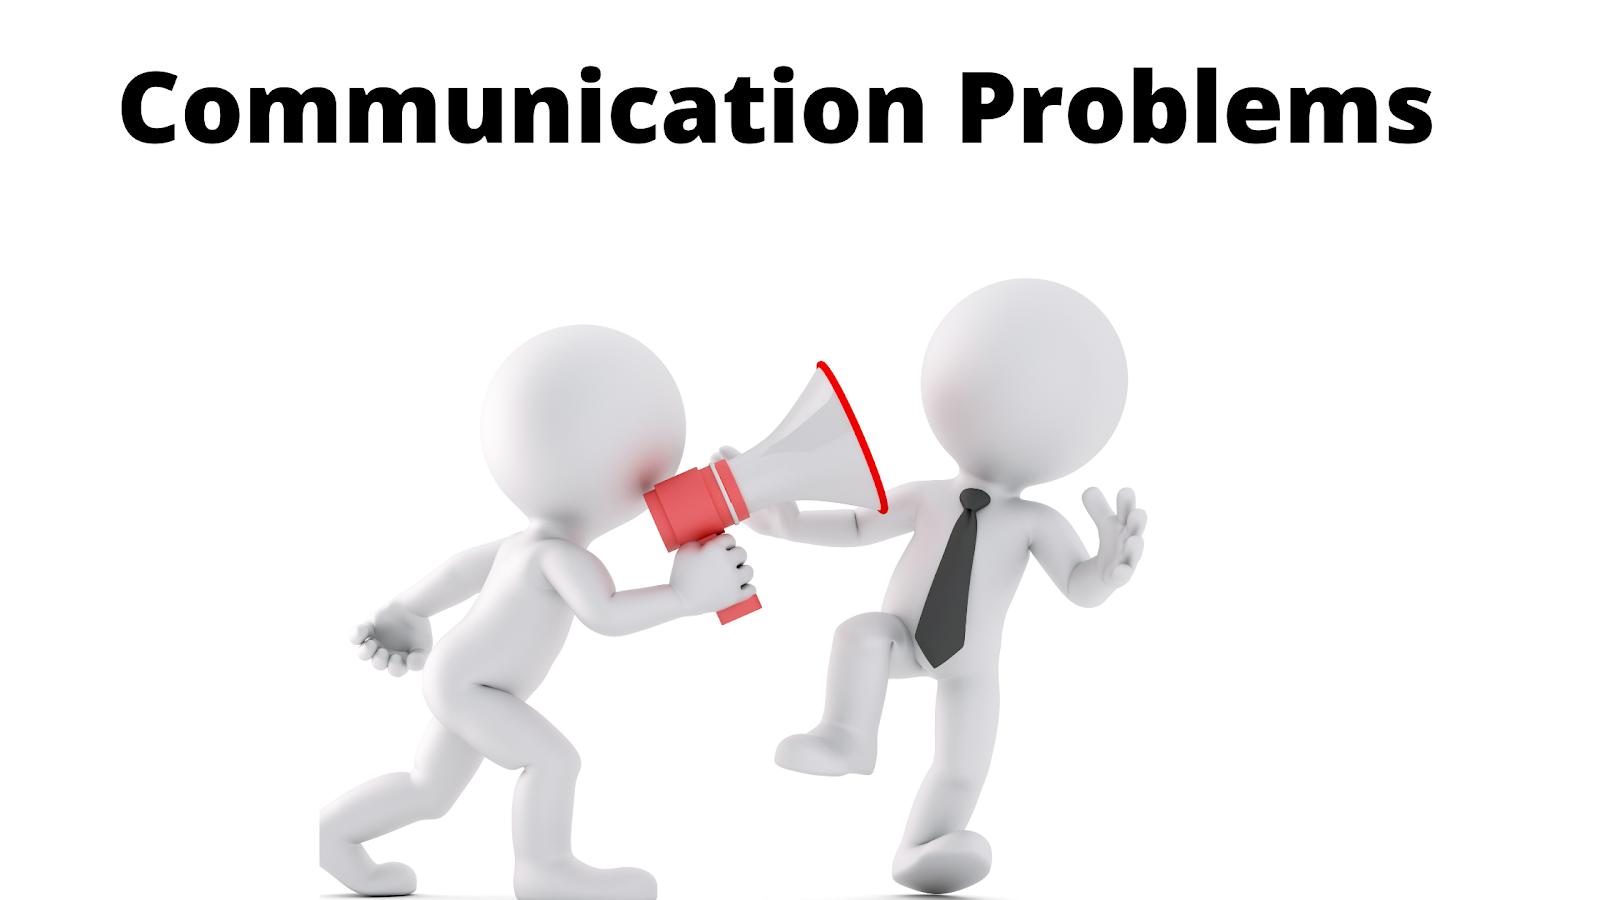 Communication skills training and problems